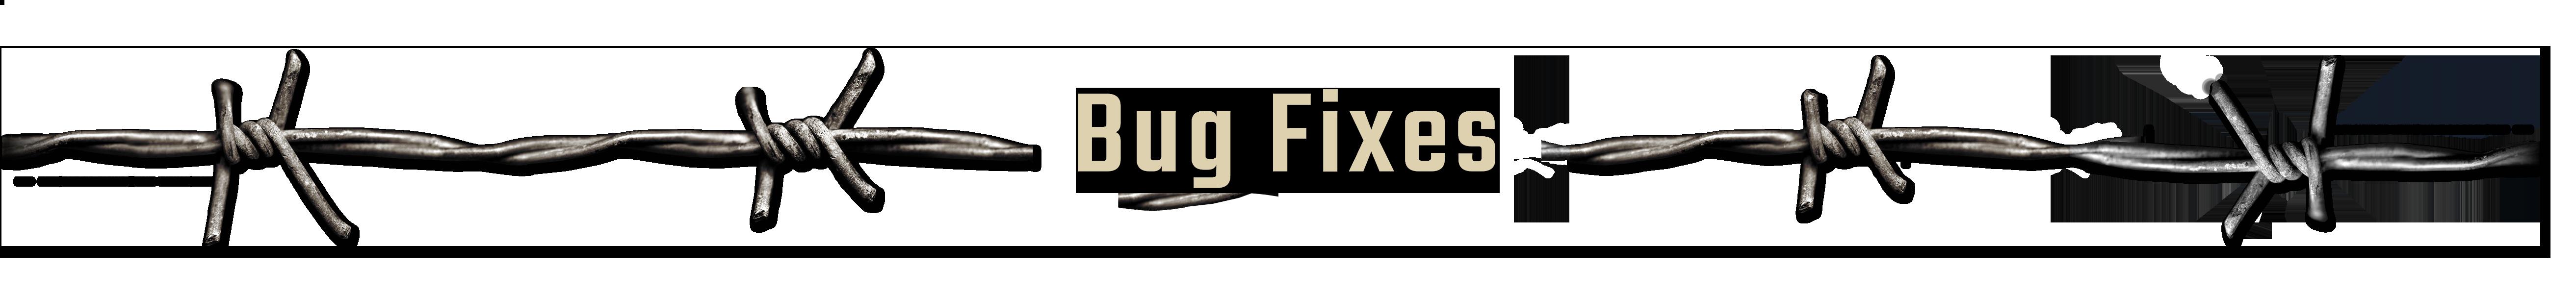 SCUM- Hotfix 0.4.91.25757